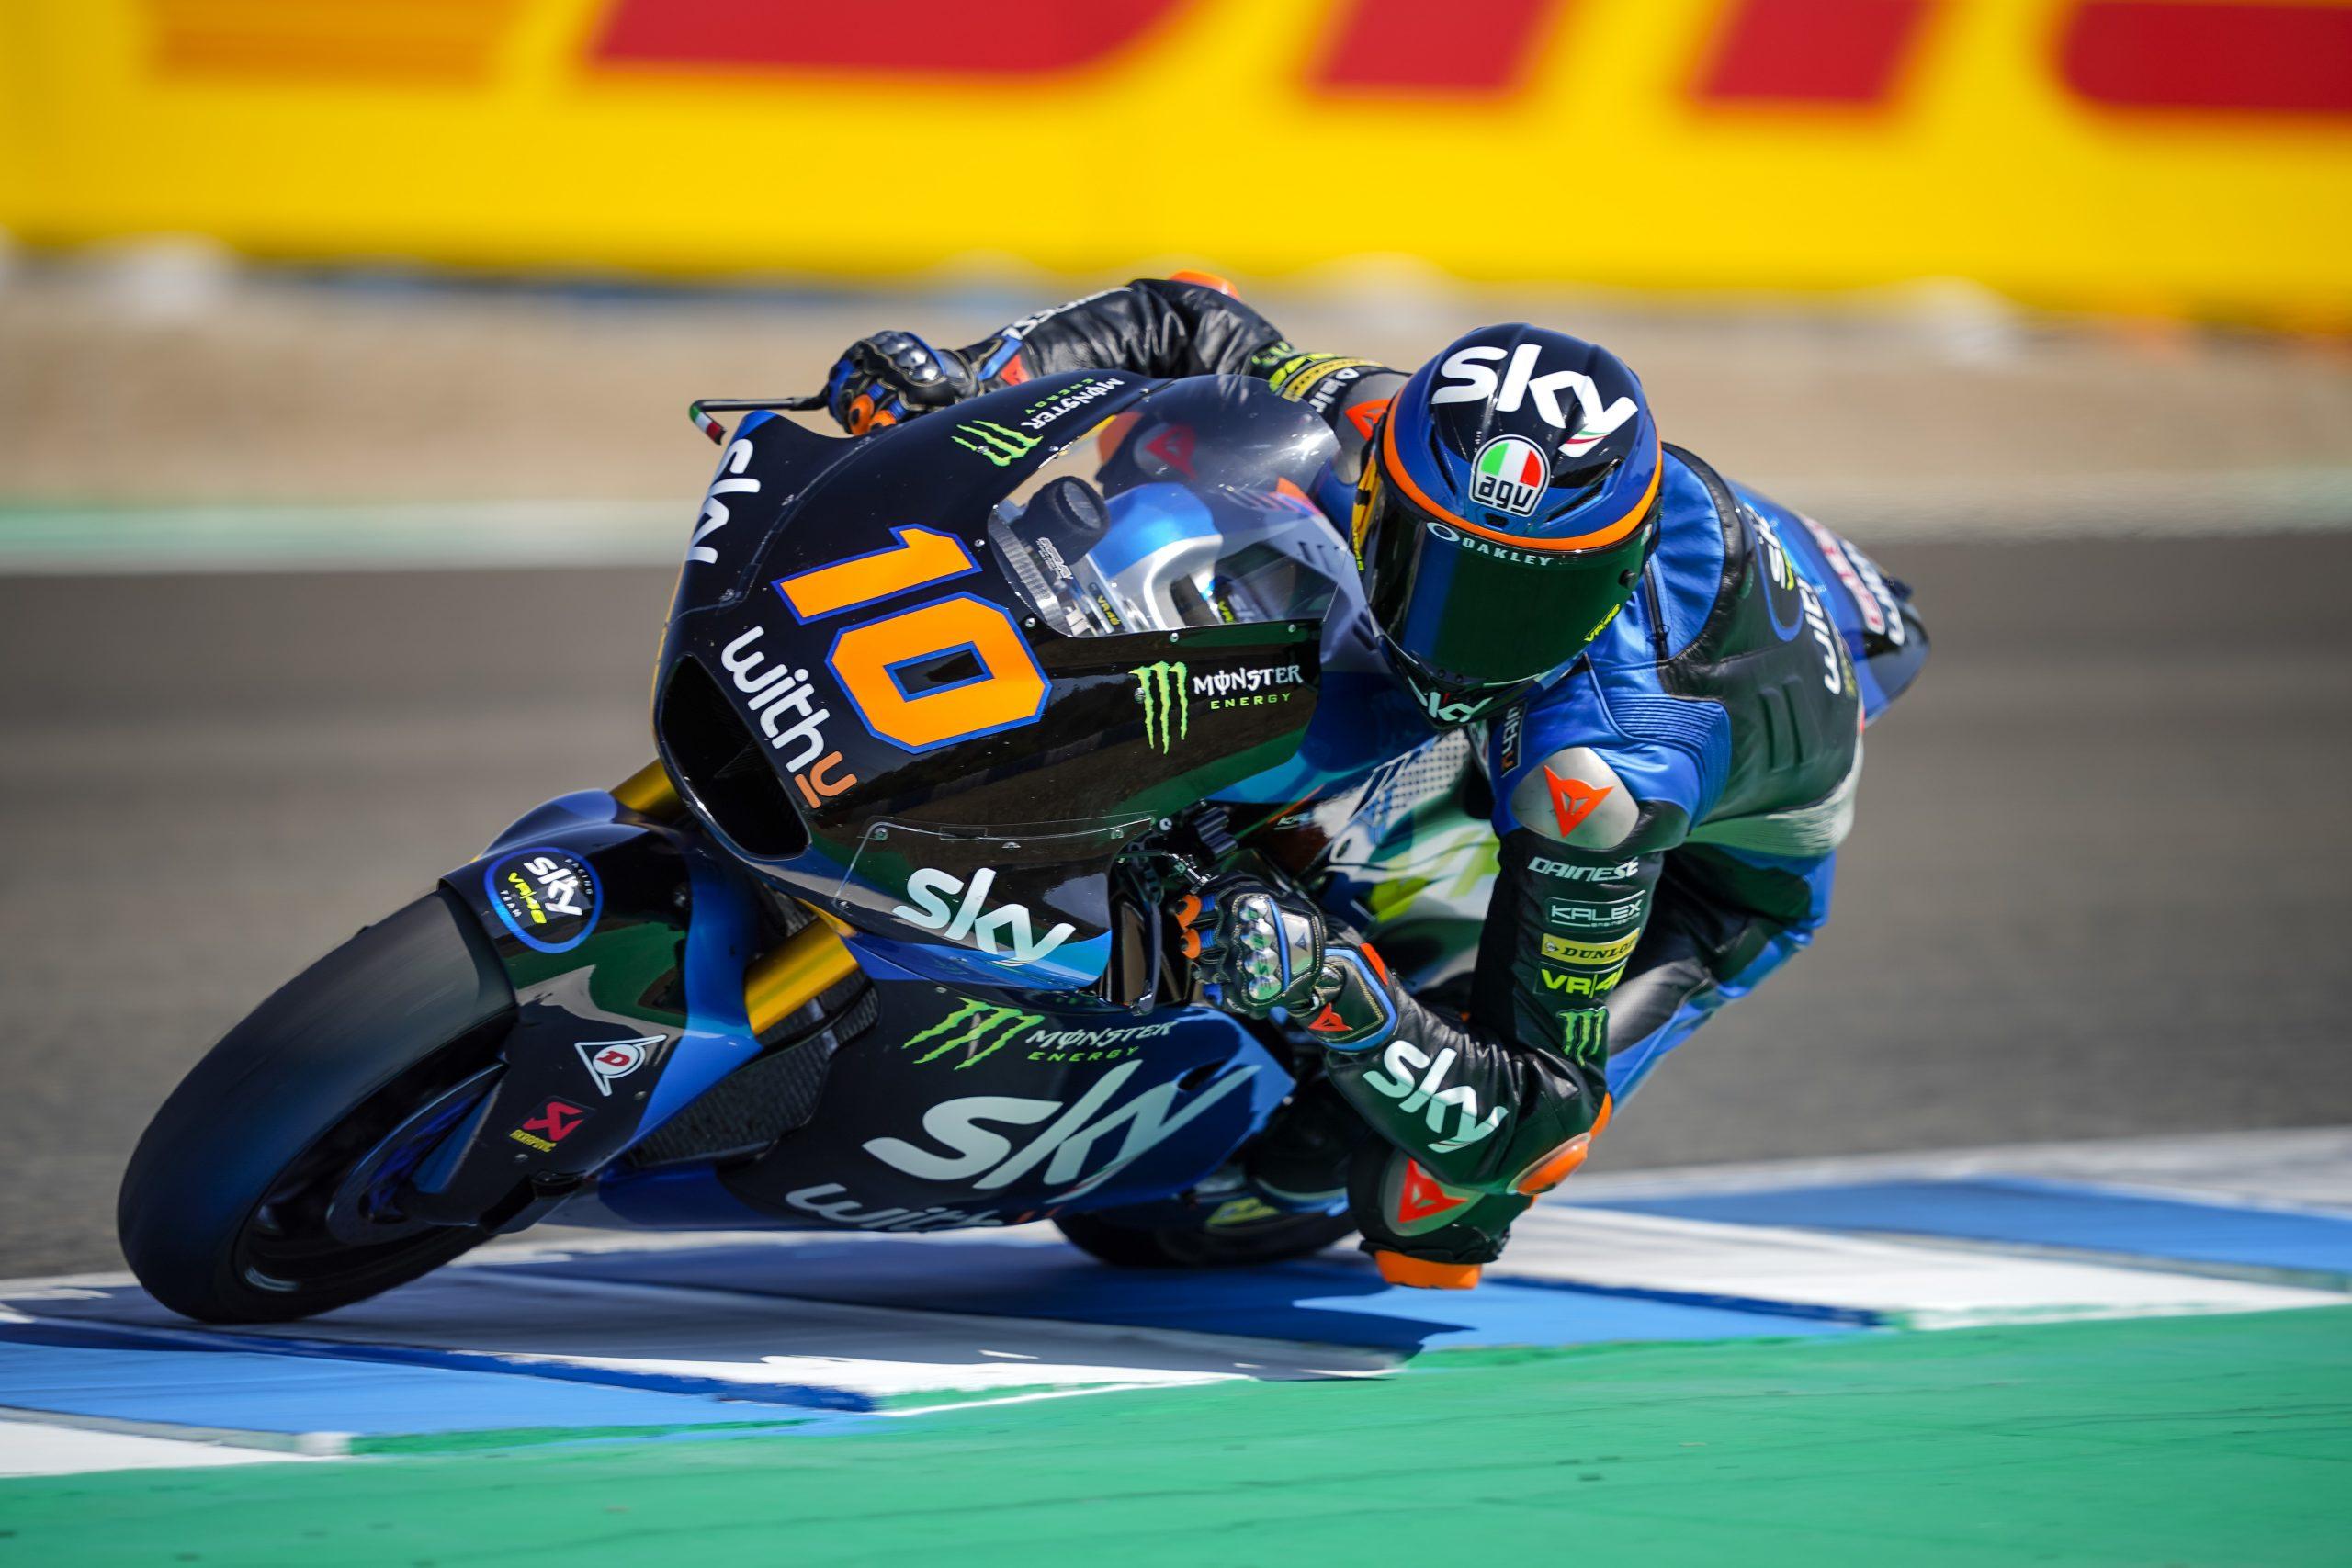 Luca Marini vence imponiendo un dominio absoluto en Jerez